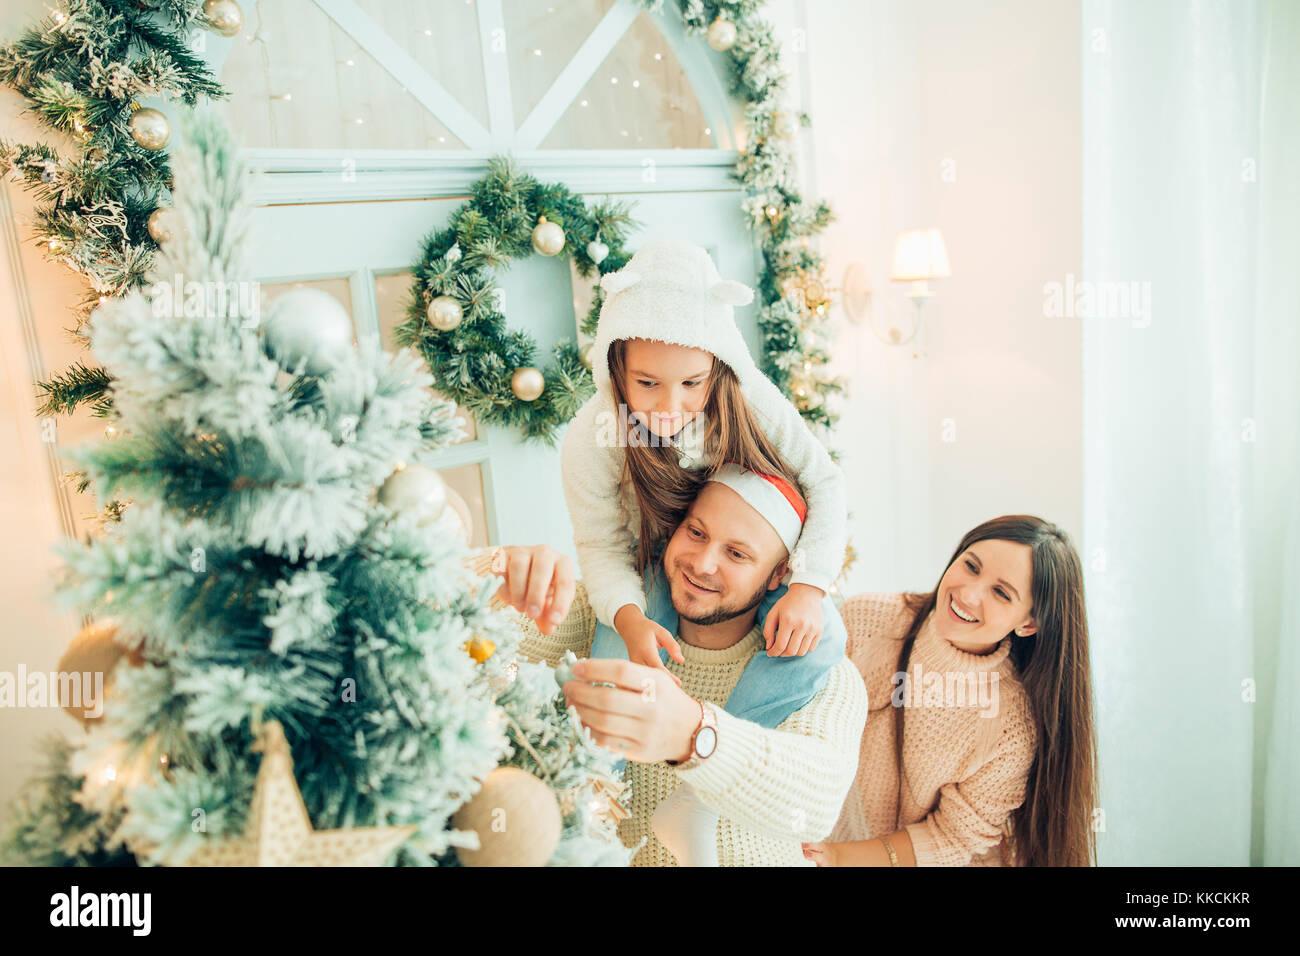 happy girl decorating Christmas tree.Family, christmas, ,happiness concept - Stock Image